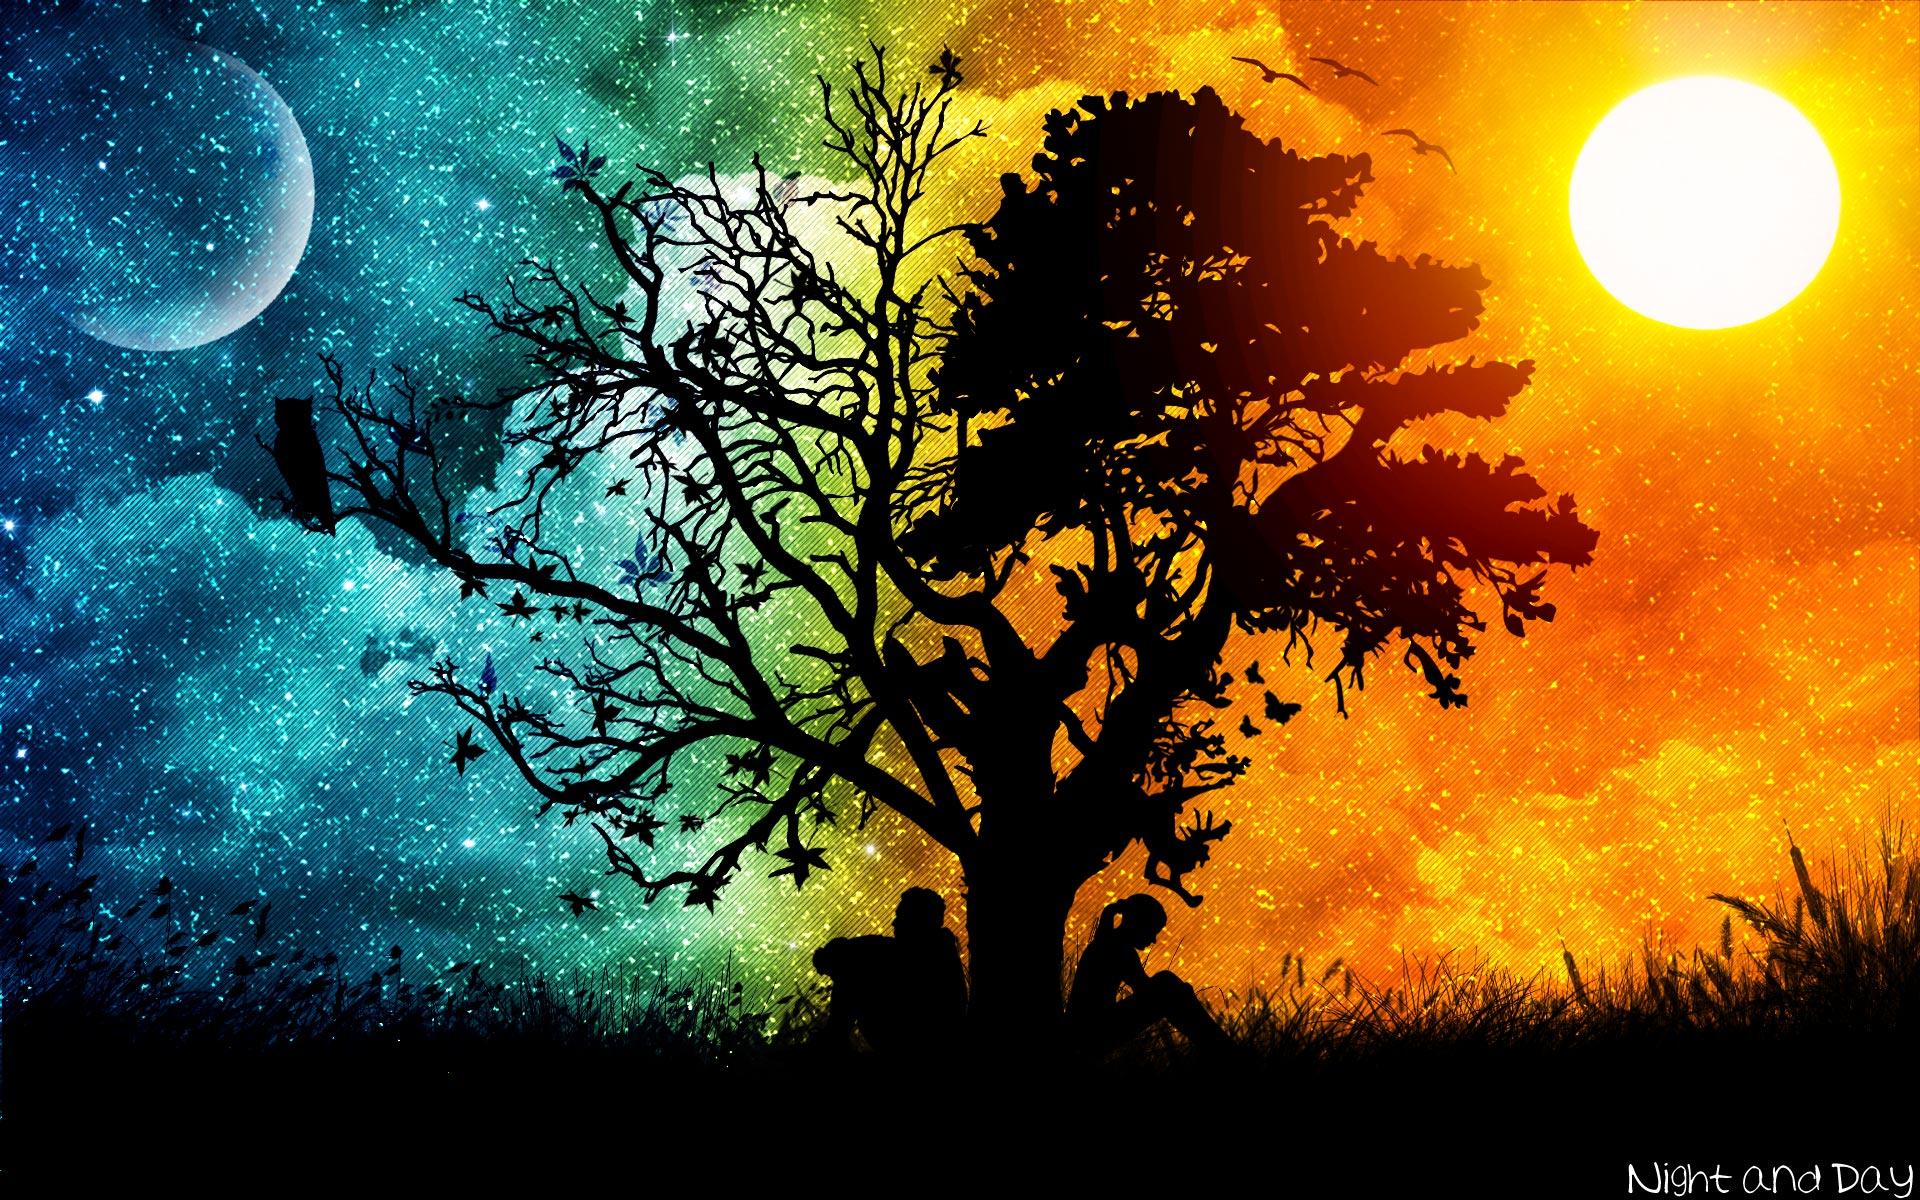 Free Tree Silhouette Wallpaper 34129 1920x1080 px